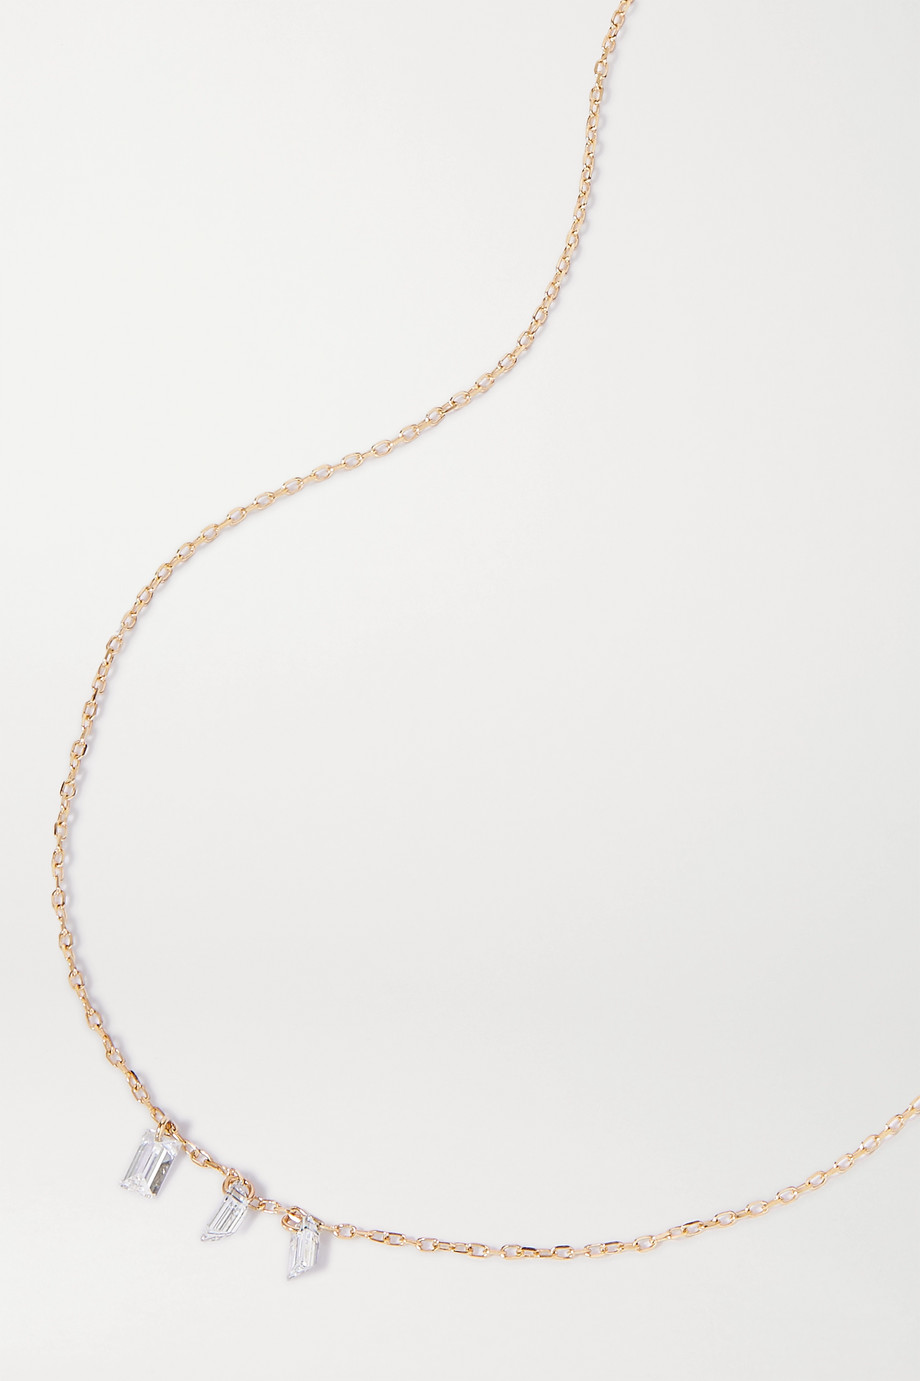 Persée Danaé gold diamond necklace